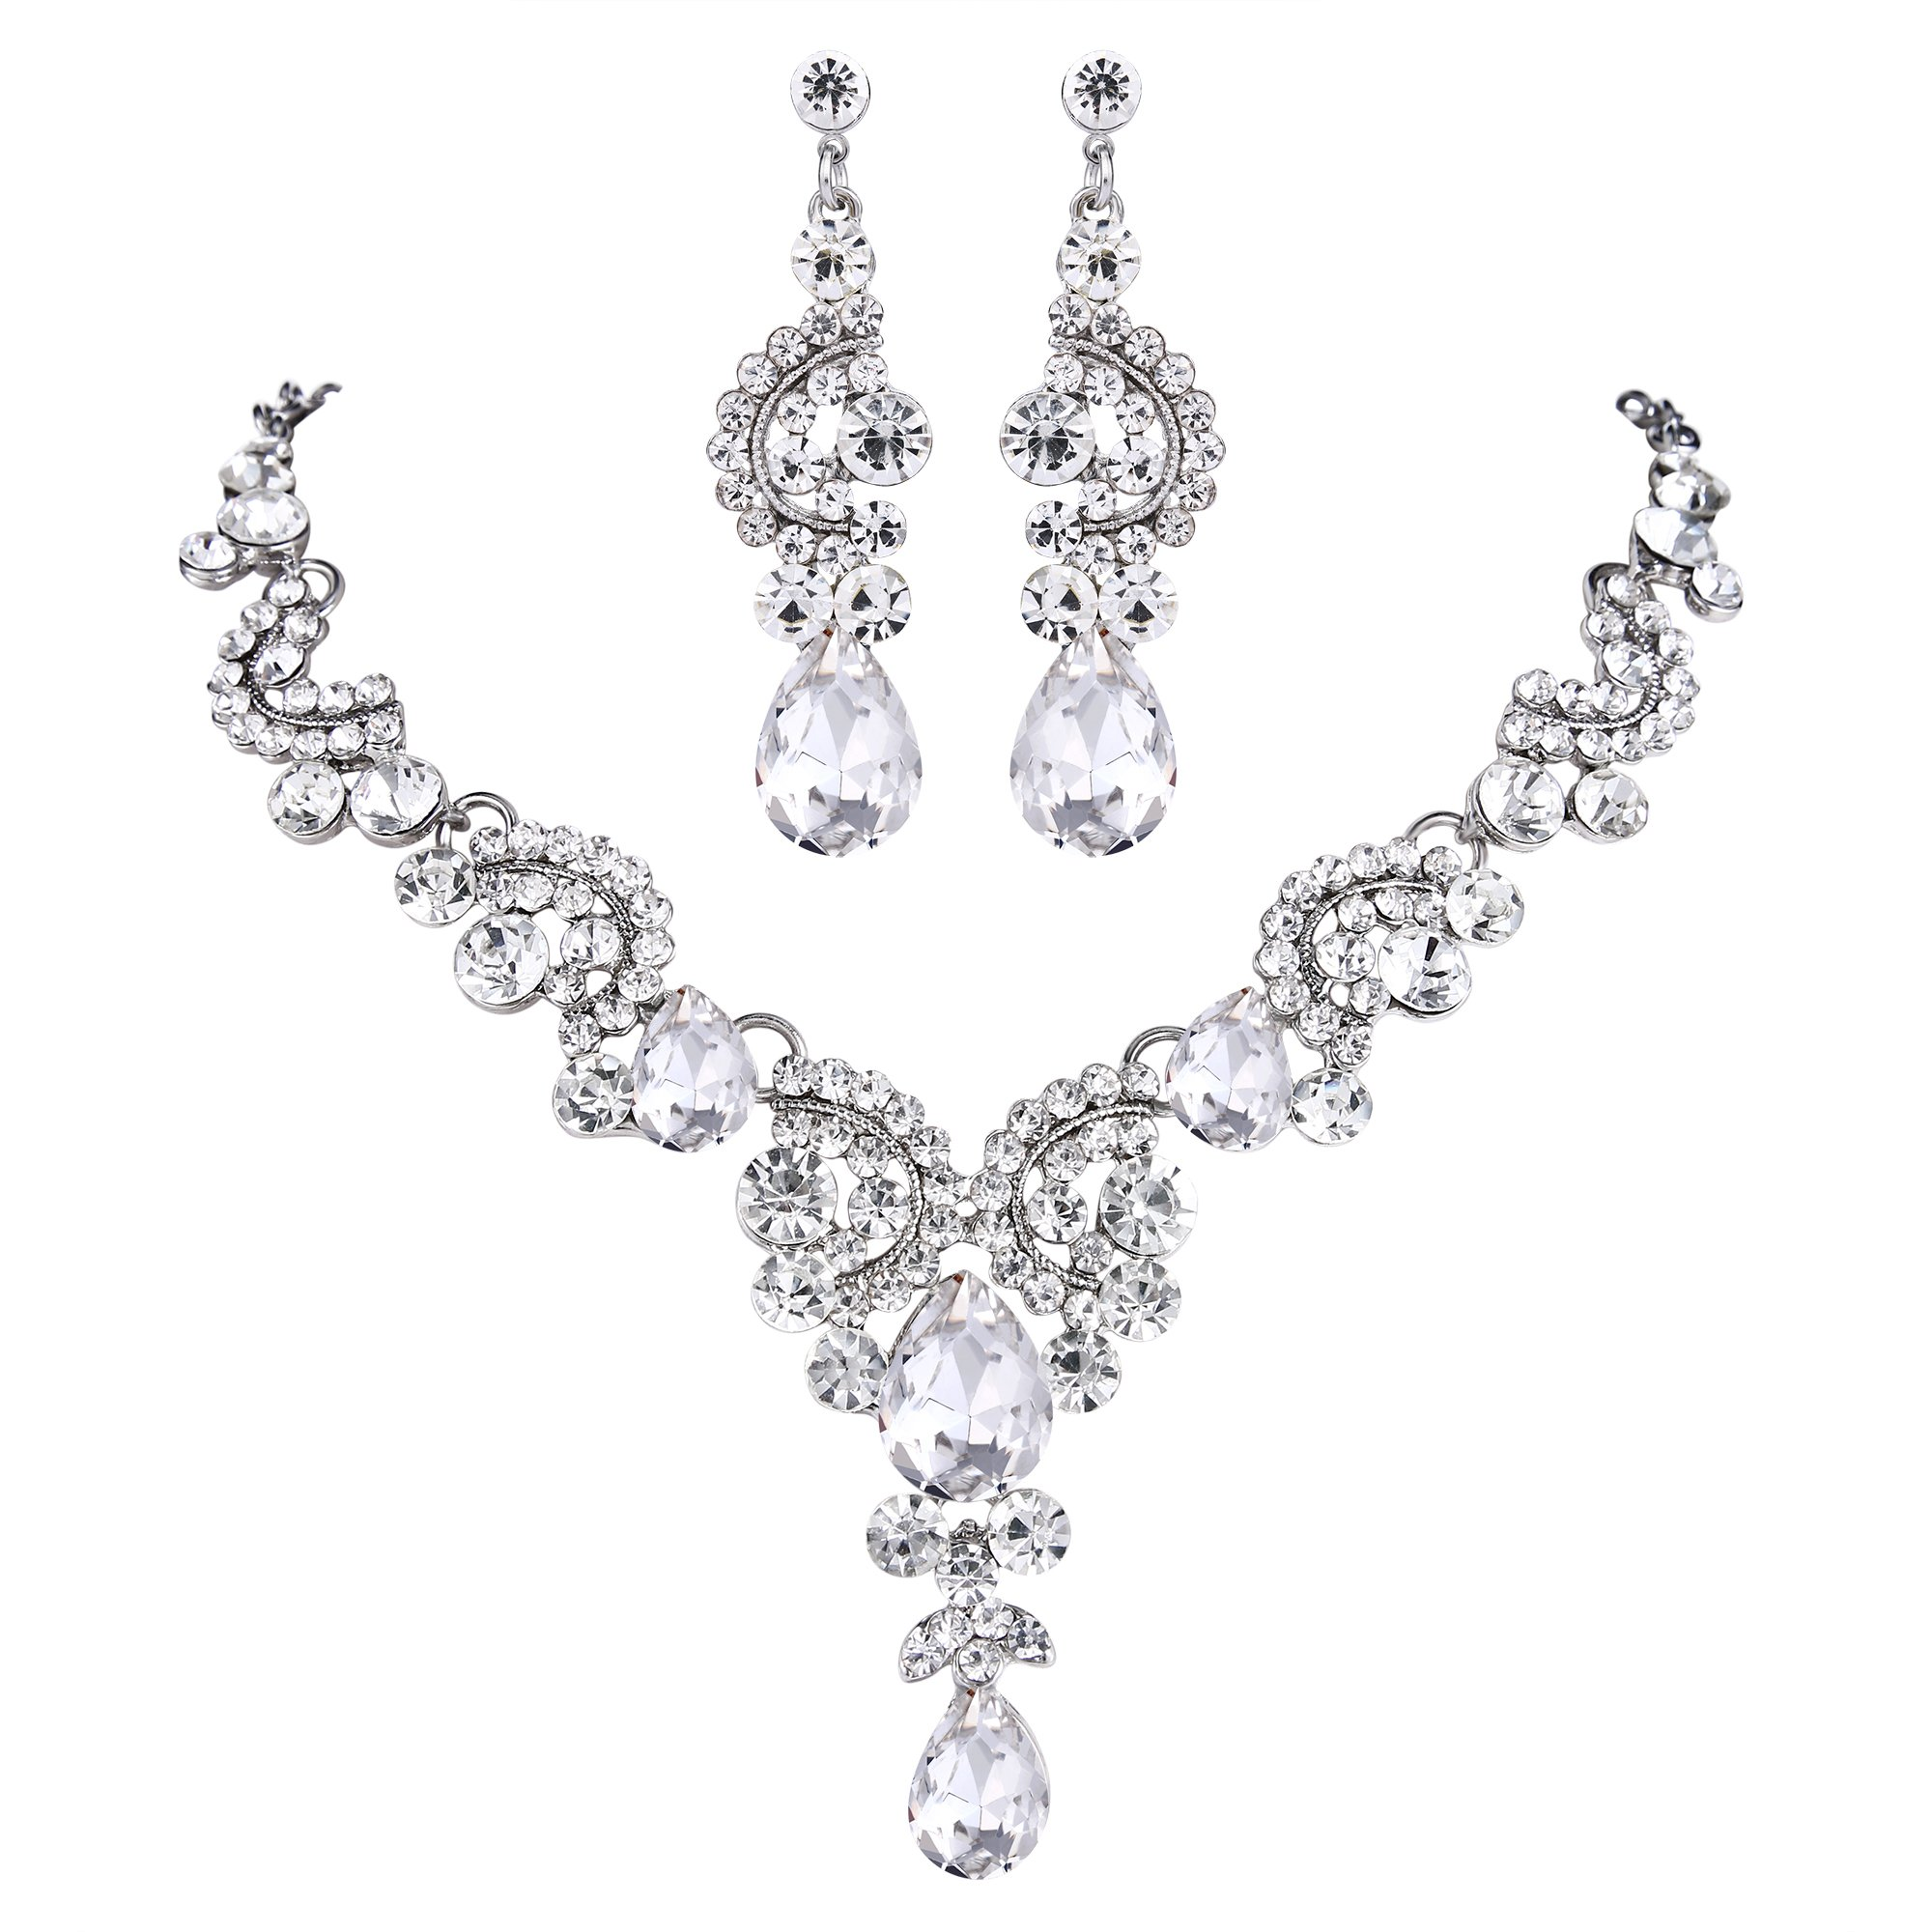 EVER FAITH Rhinestone Crystal Bridal Floral Wave Teardrop Necklace Earrings Set Clear Silver-Tone